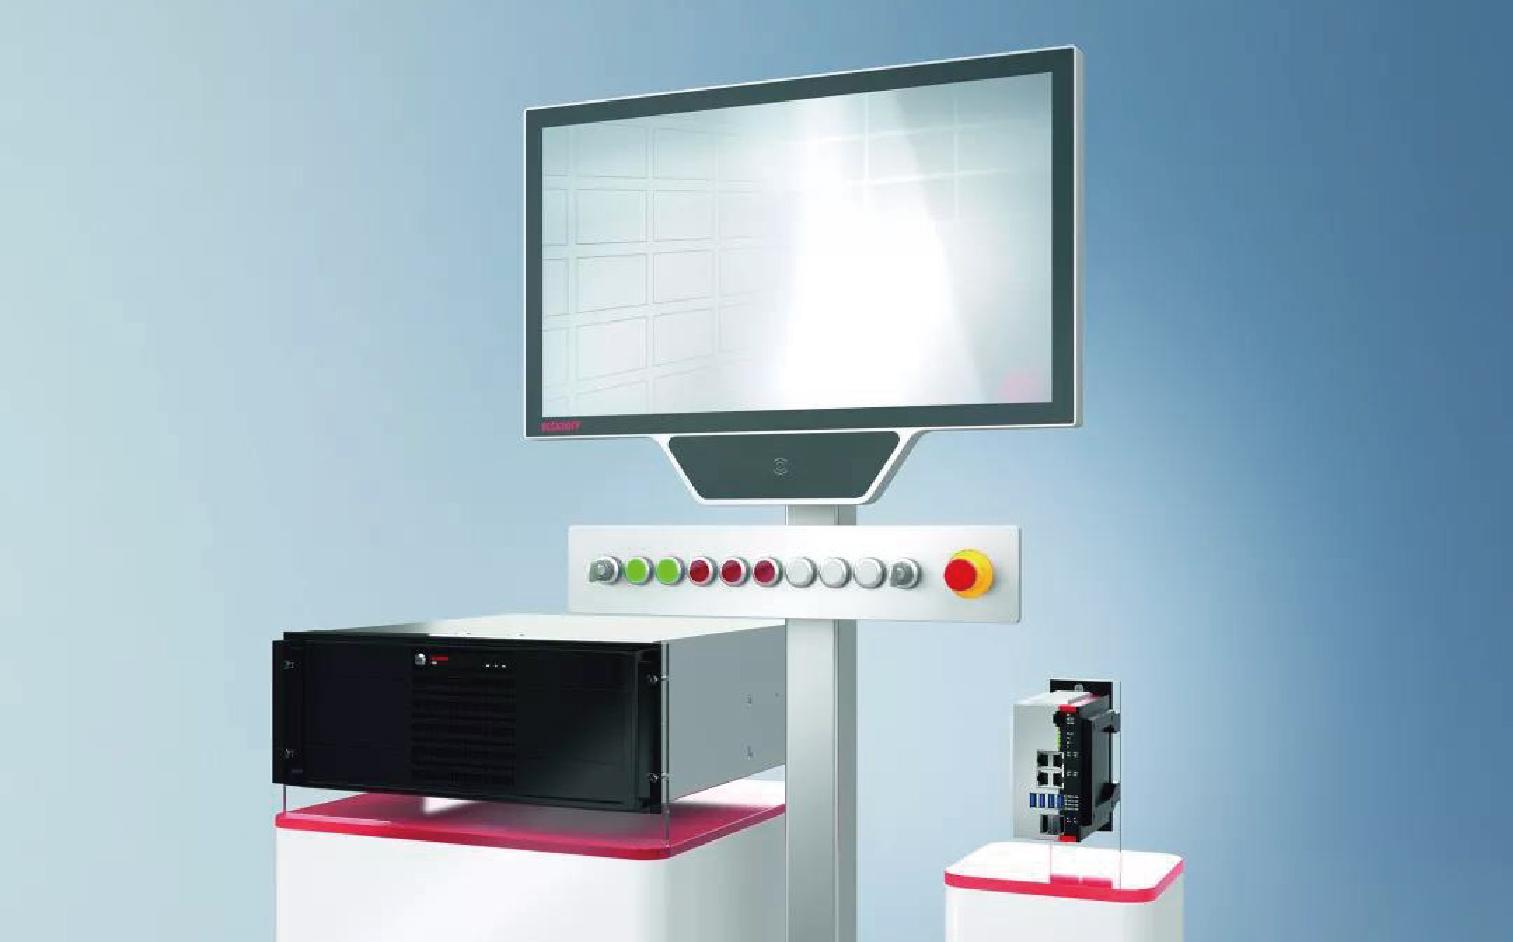 AHTE News | 德国汽车制造商将全球采购倍福工业 PC 和控制面板